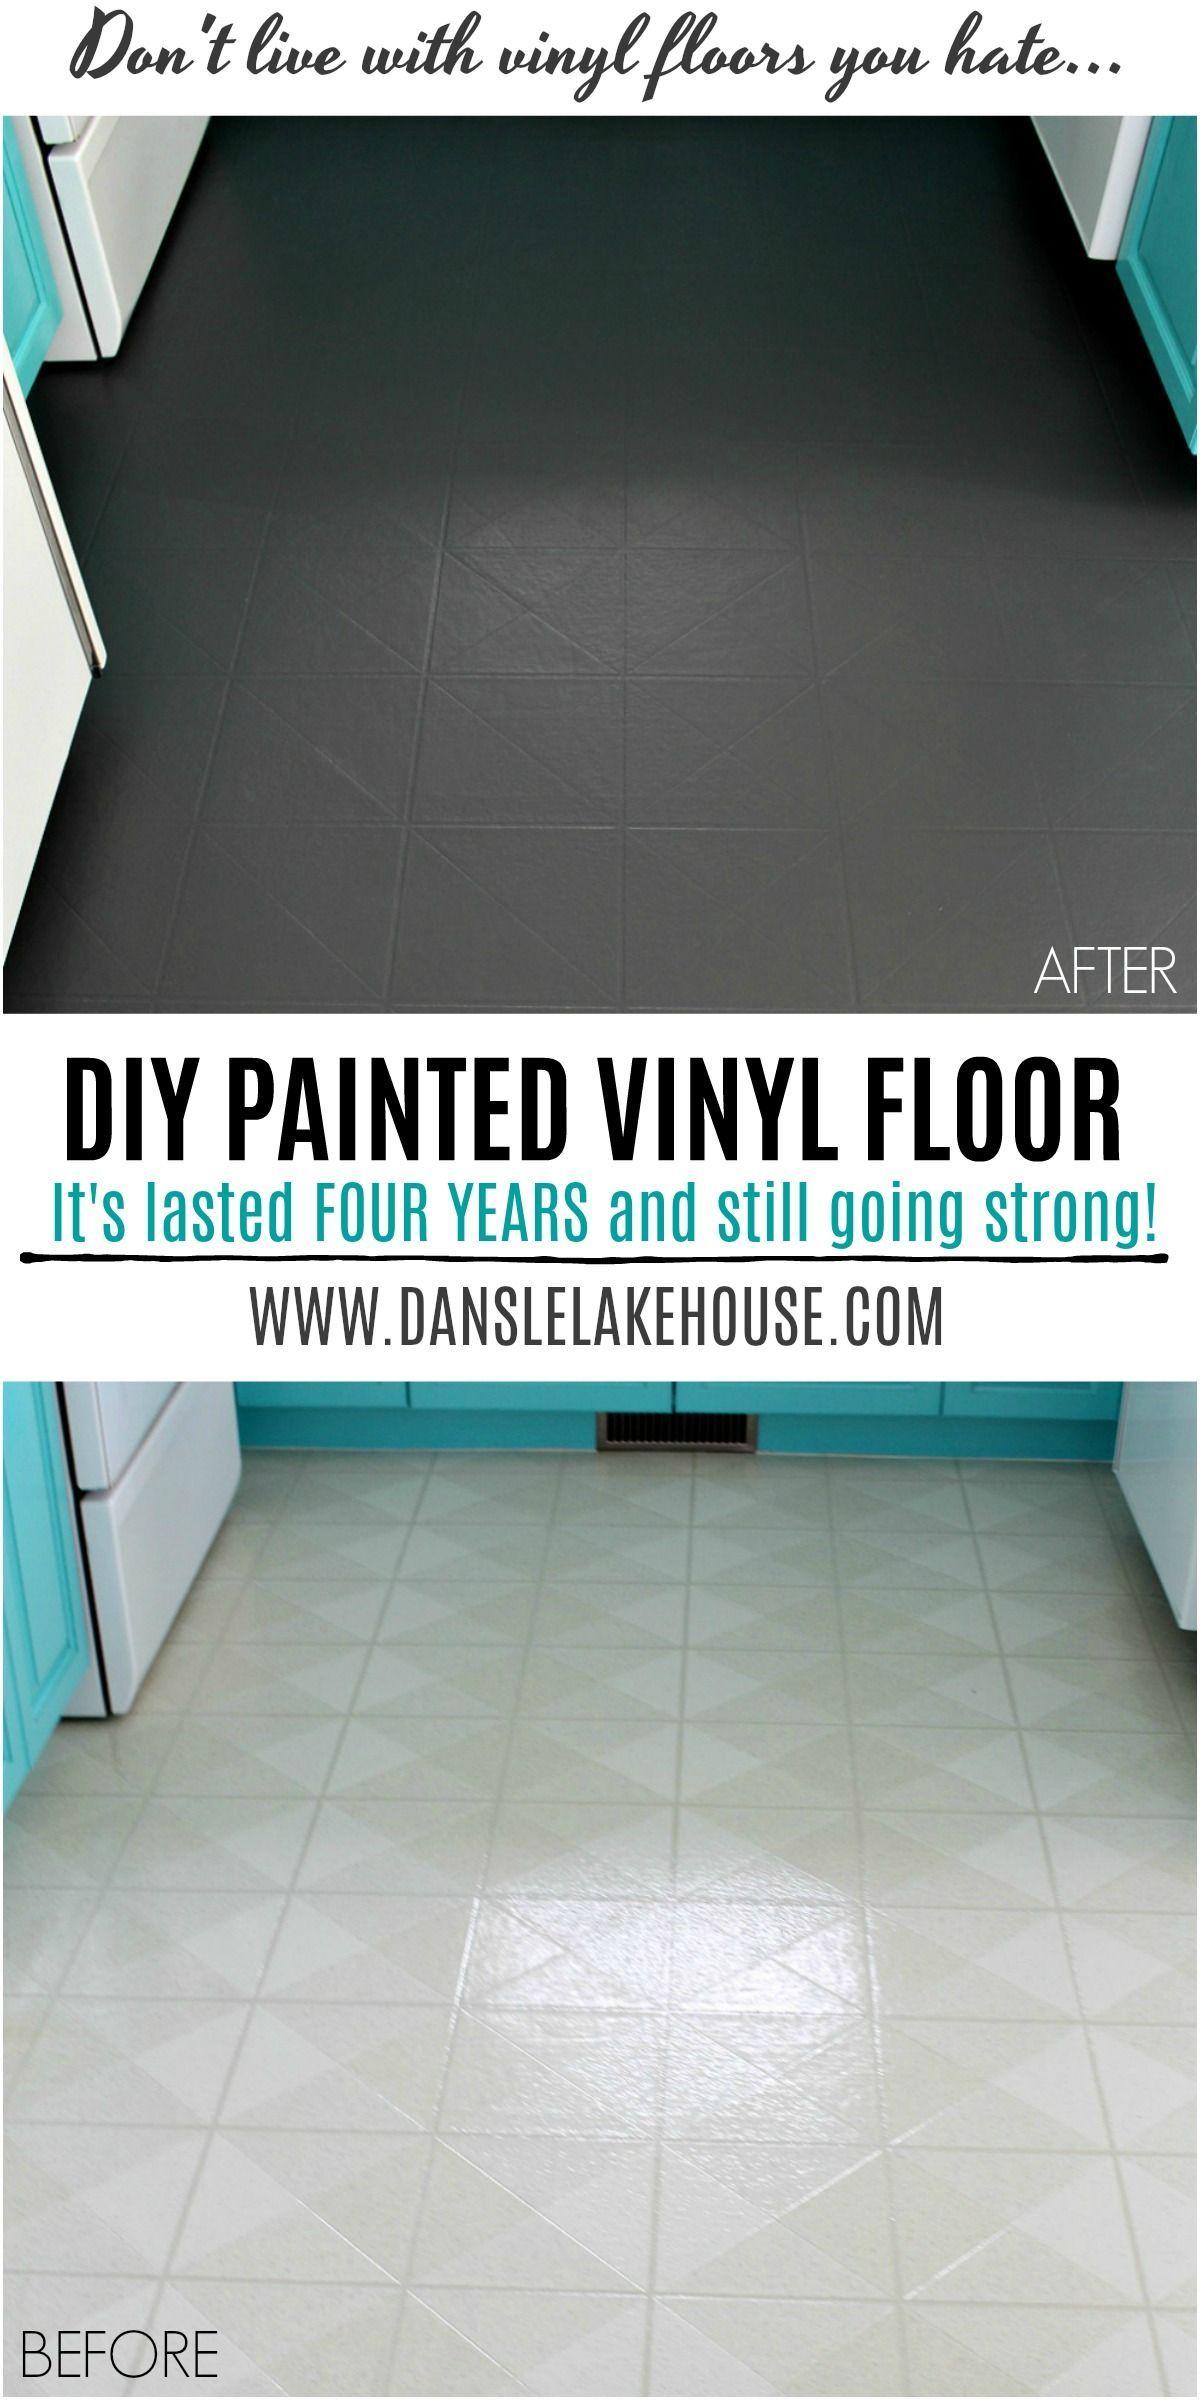 How to Paint a Vinyl Floor   DIY Painted Floors   Dans le ...